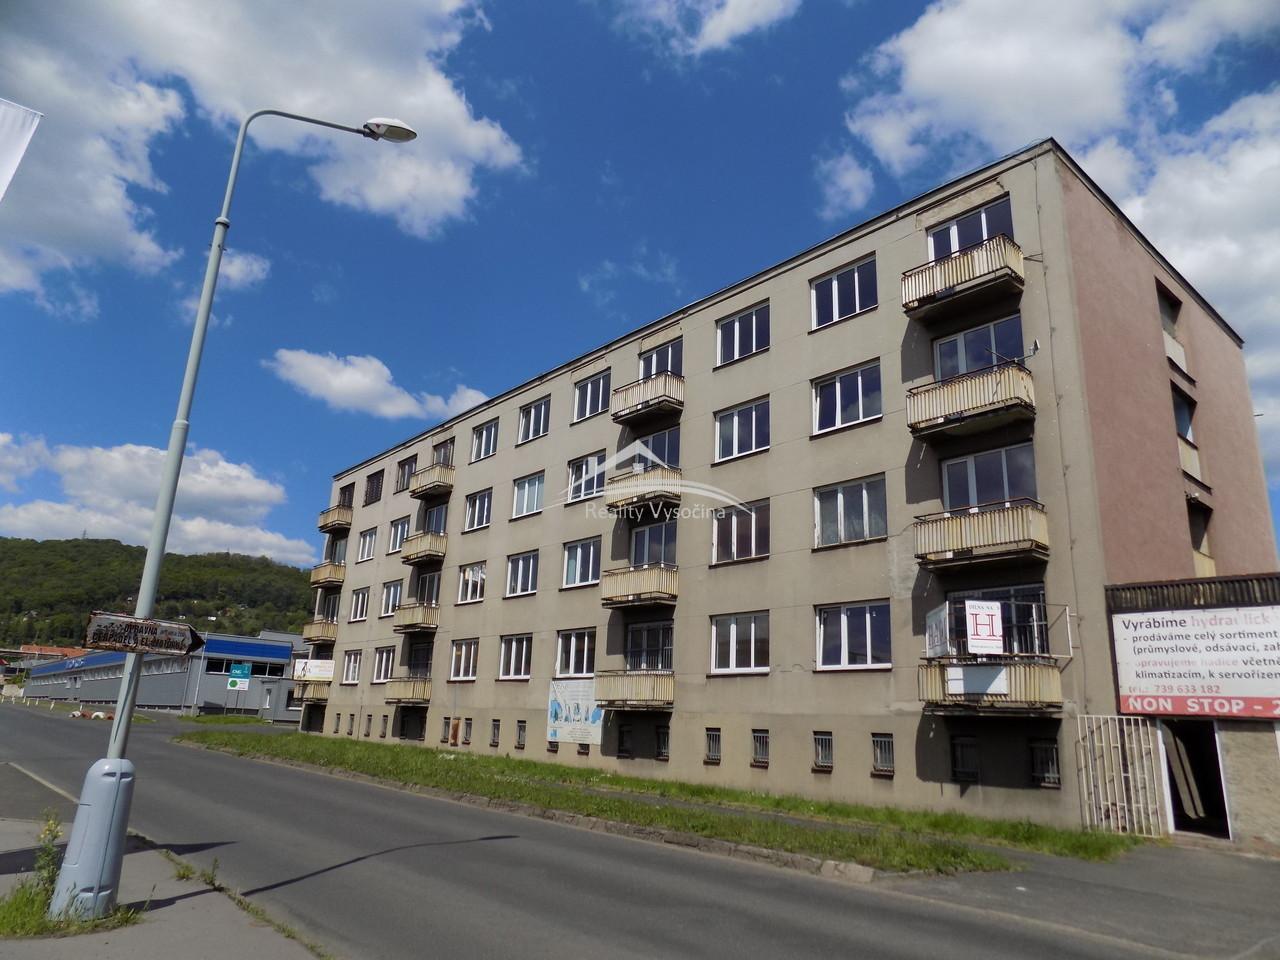 Pronájem bytu 4+1/2xB, OV, 110m2 v Ústí nad Labem.